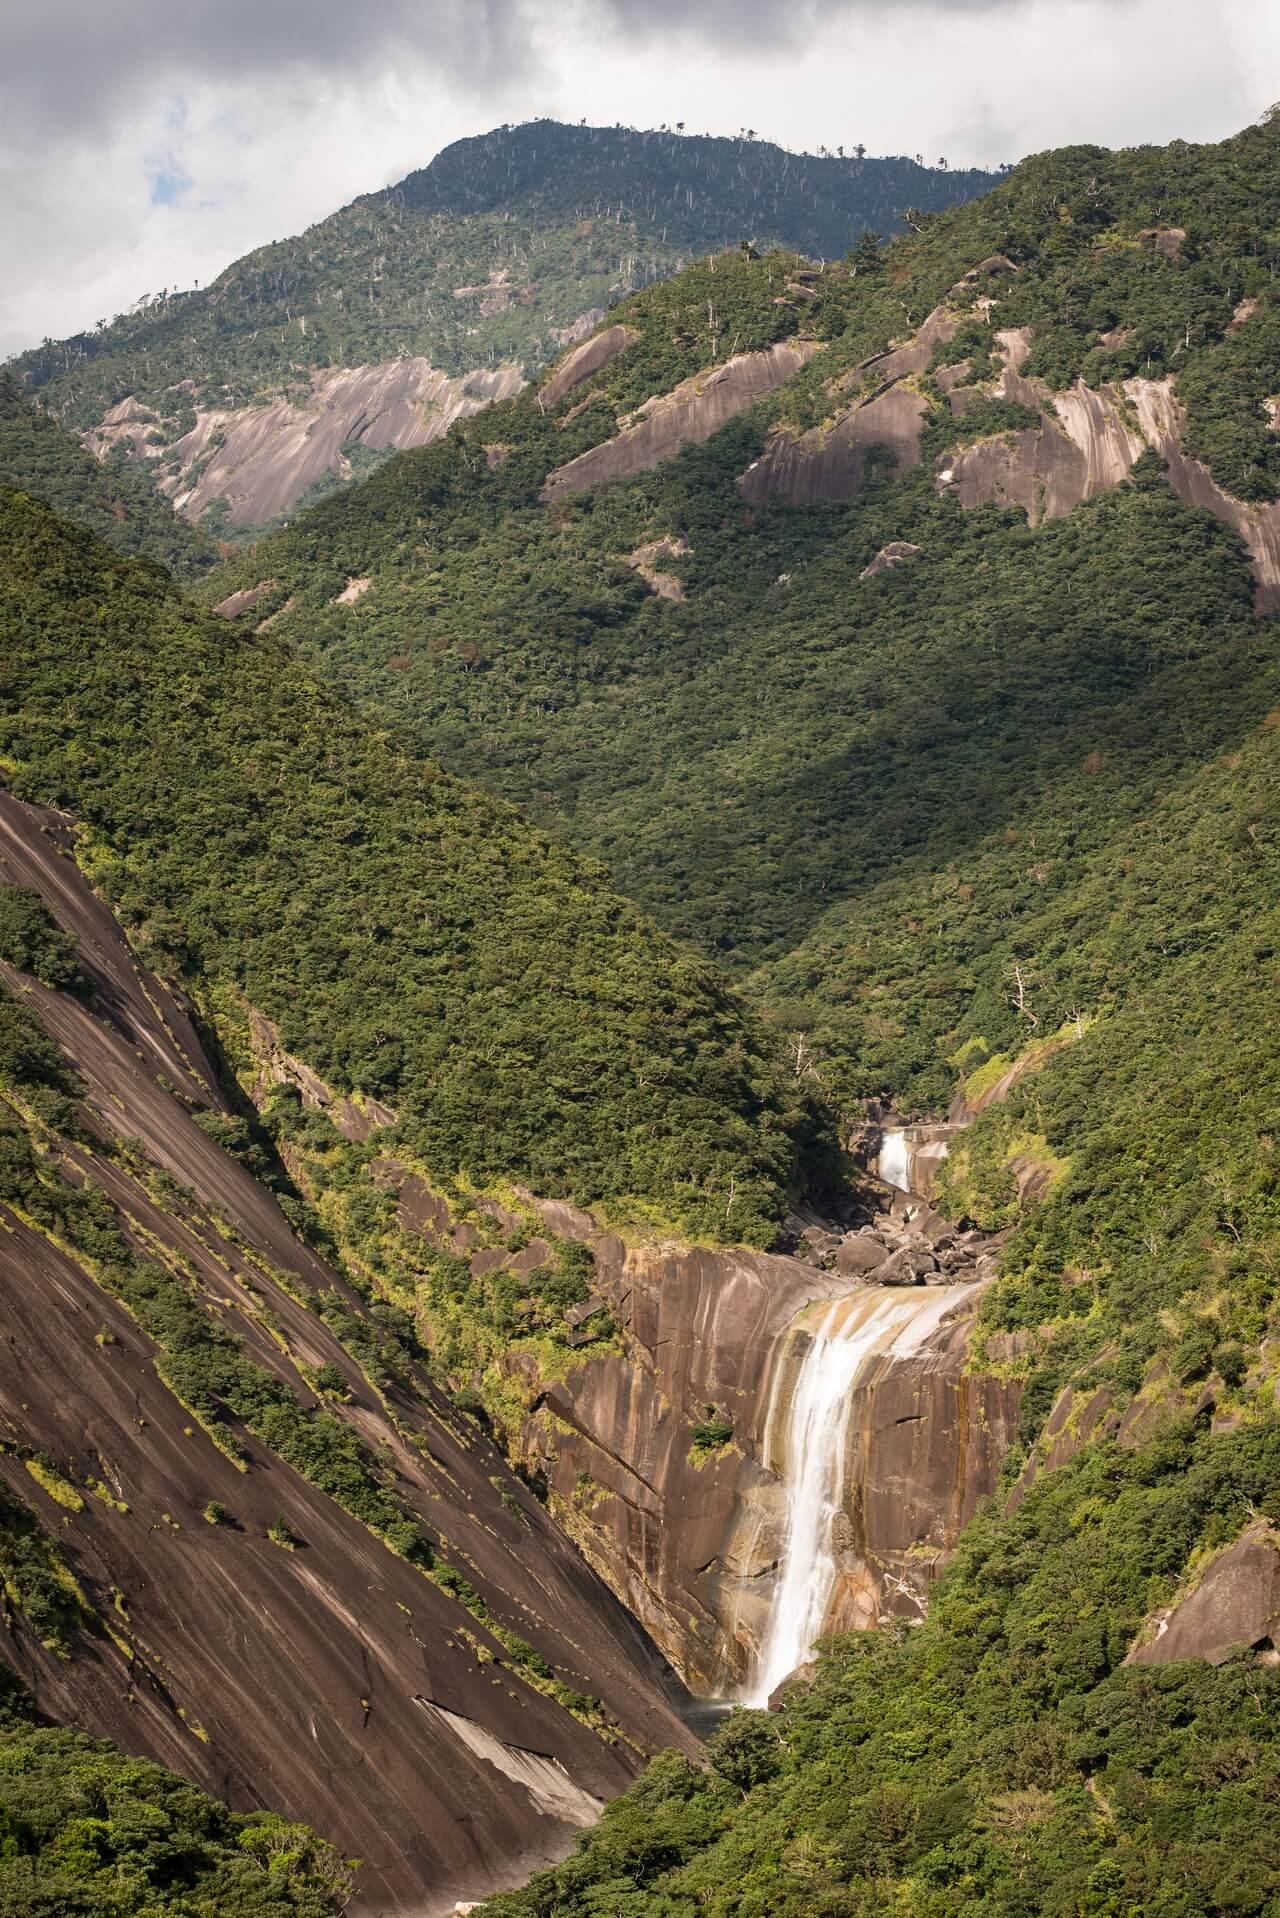 Japan: Yakushima Island 千尋の滝 Senpiro-no-taki, Fotograf: Steffen Lohse